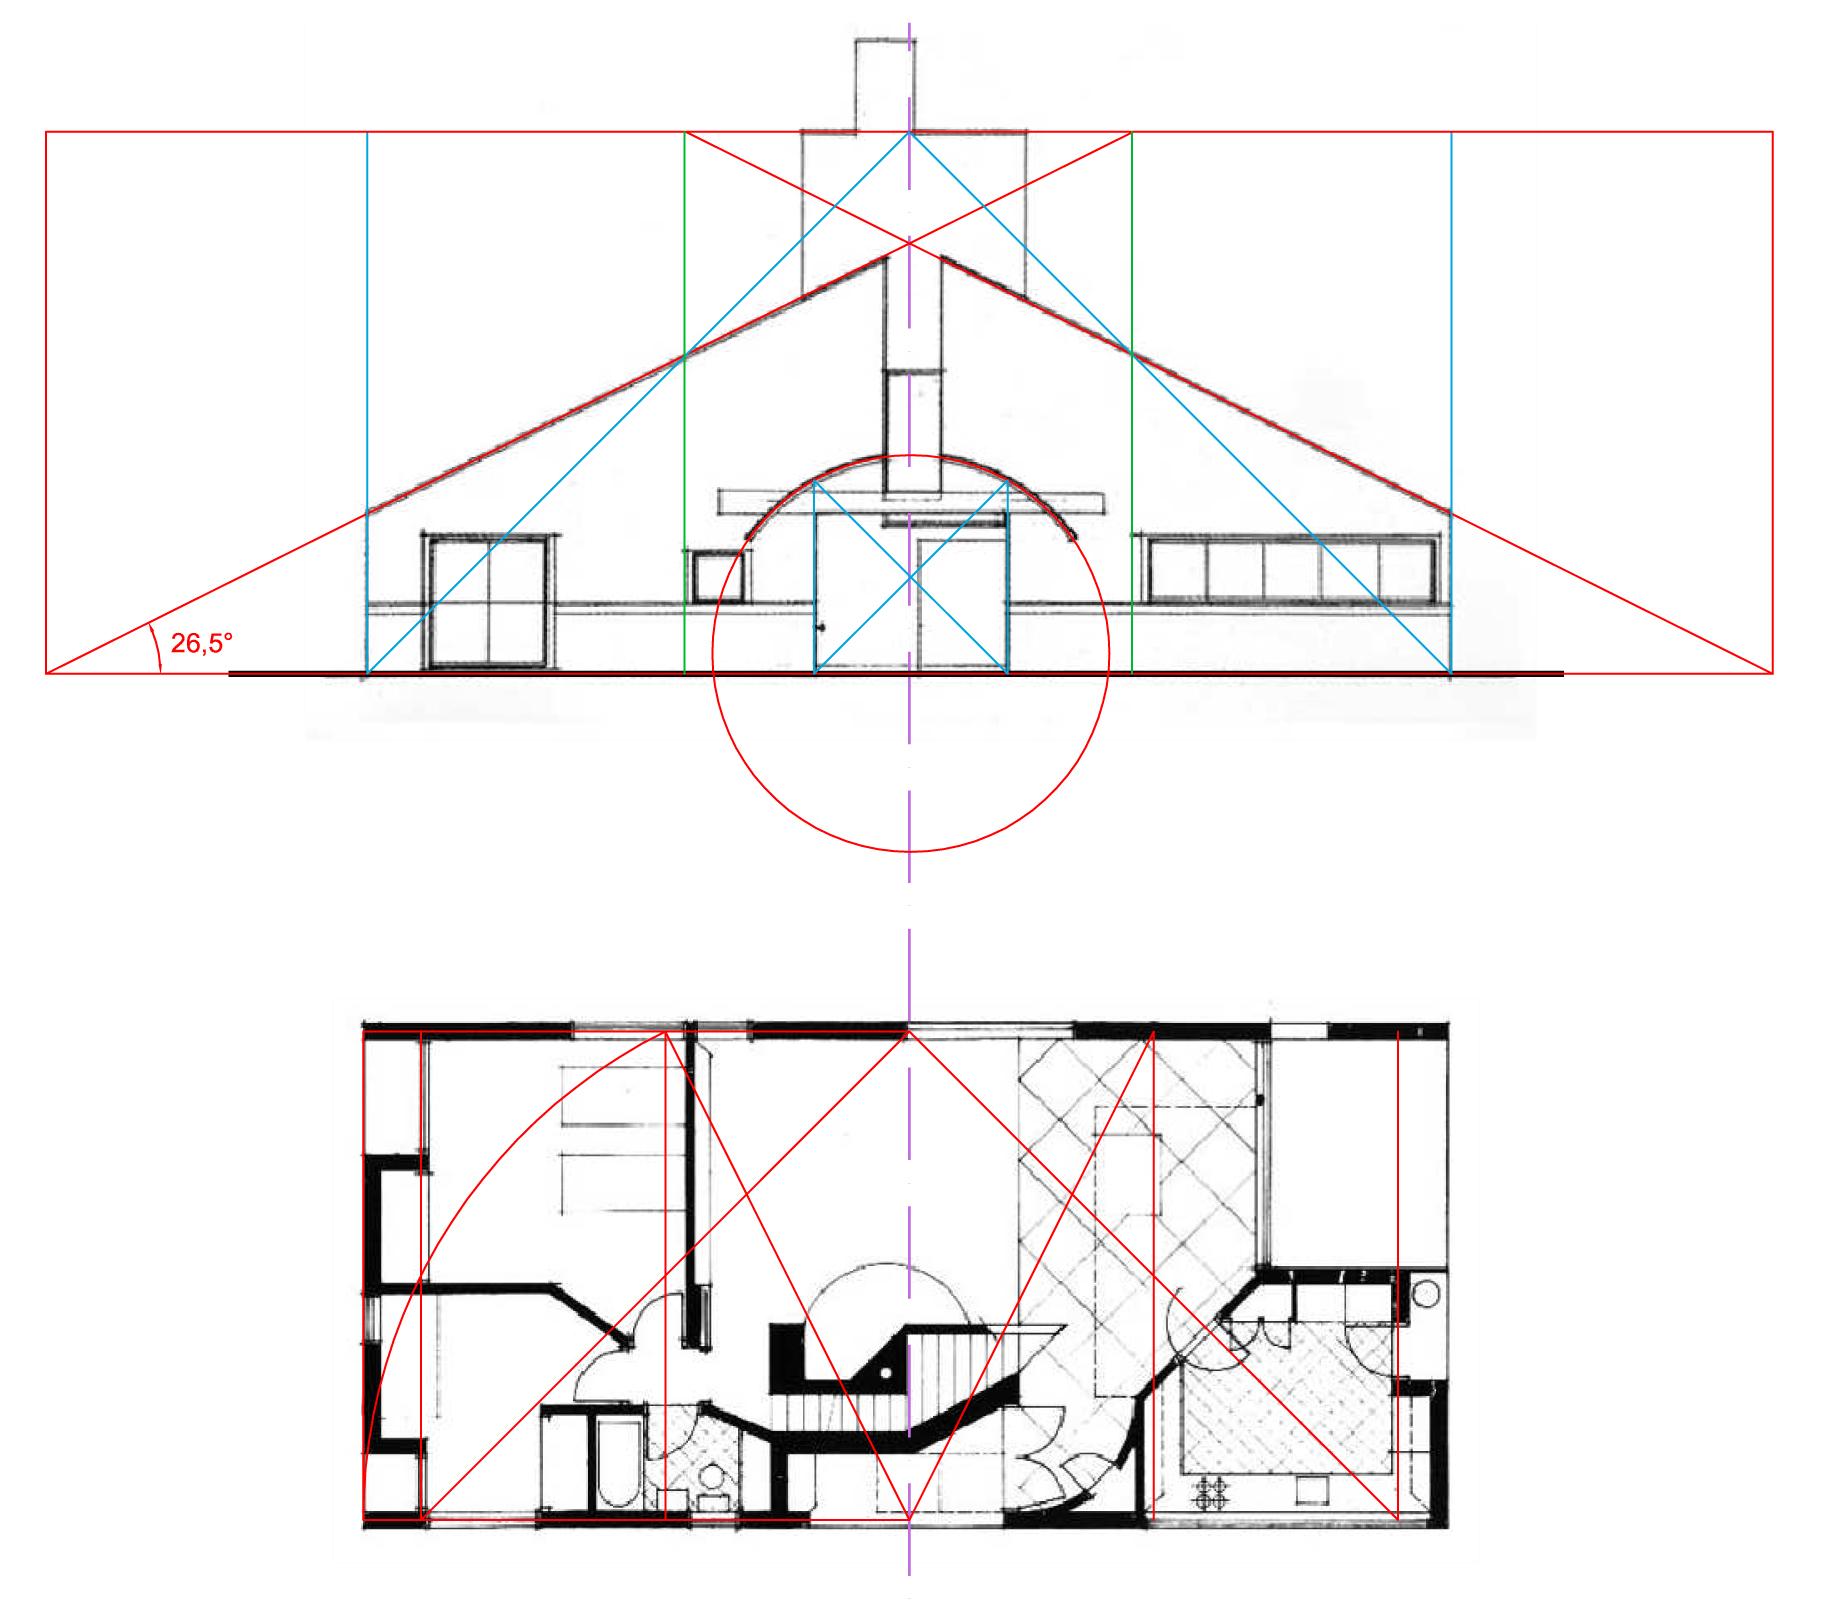 Vanna venturi house tra memoria e maniera del moderno for Design moderno casa contemporanea con planimetria